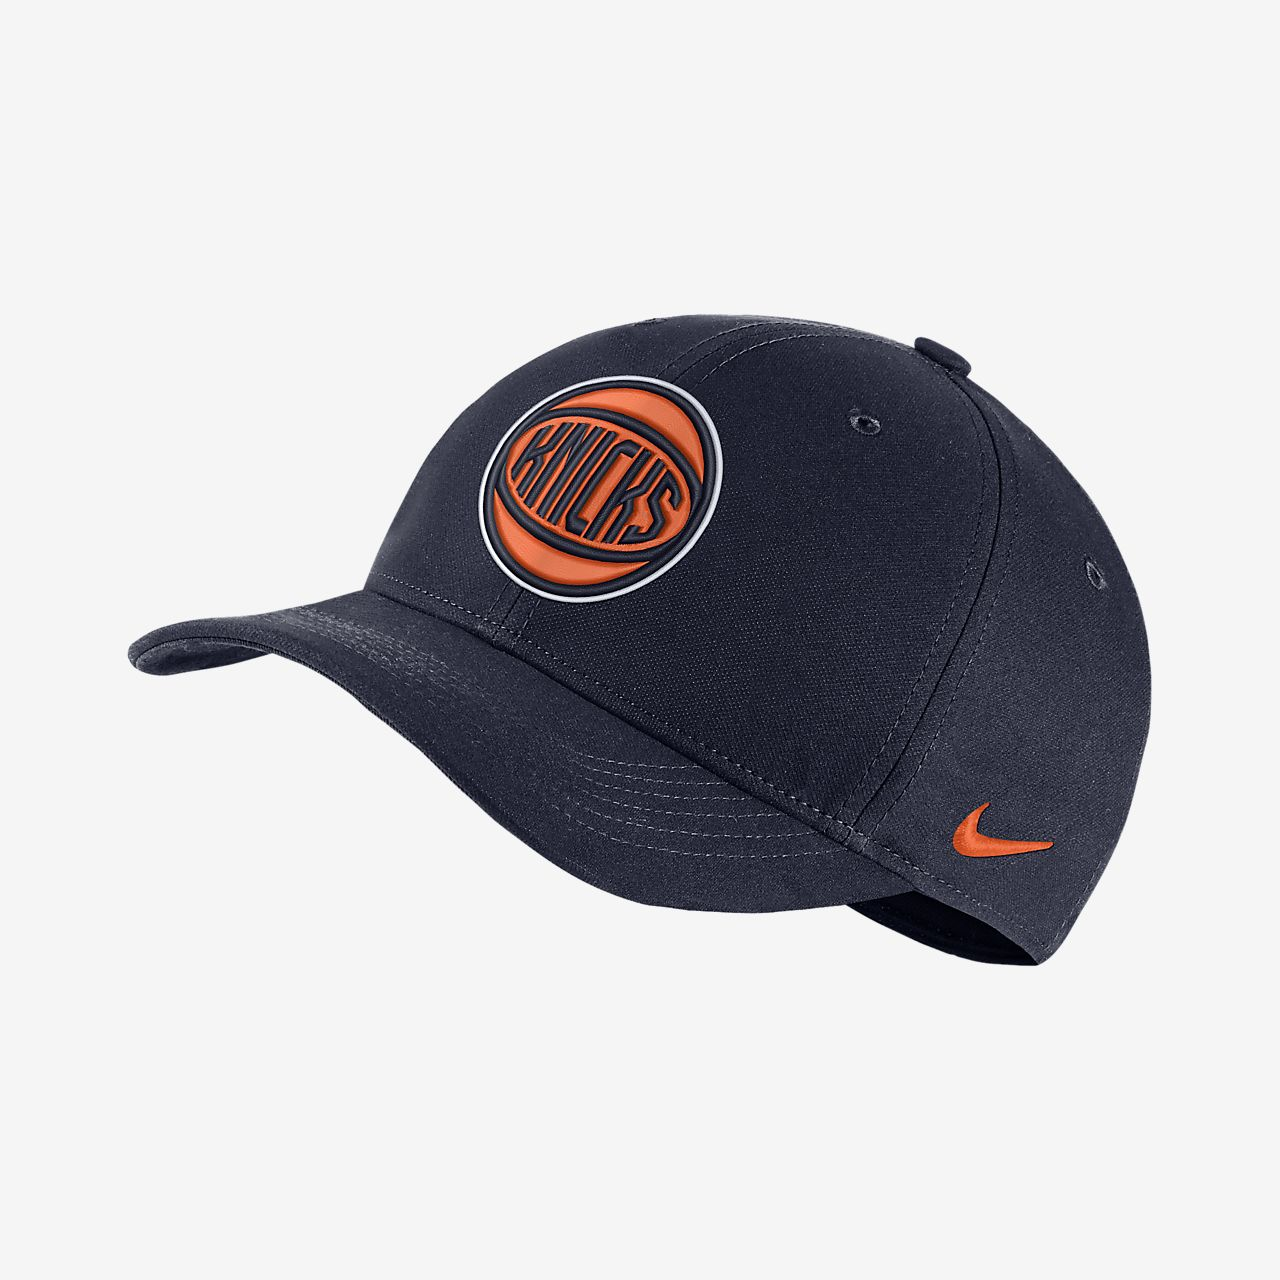 New York Knicks City Edition Nike AeroBill Classic99 NBA-s sapka